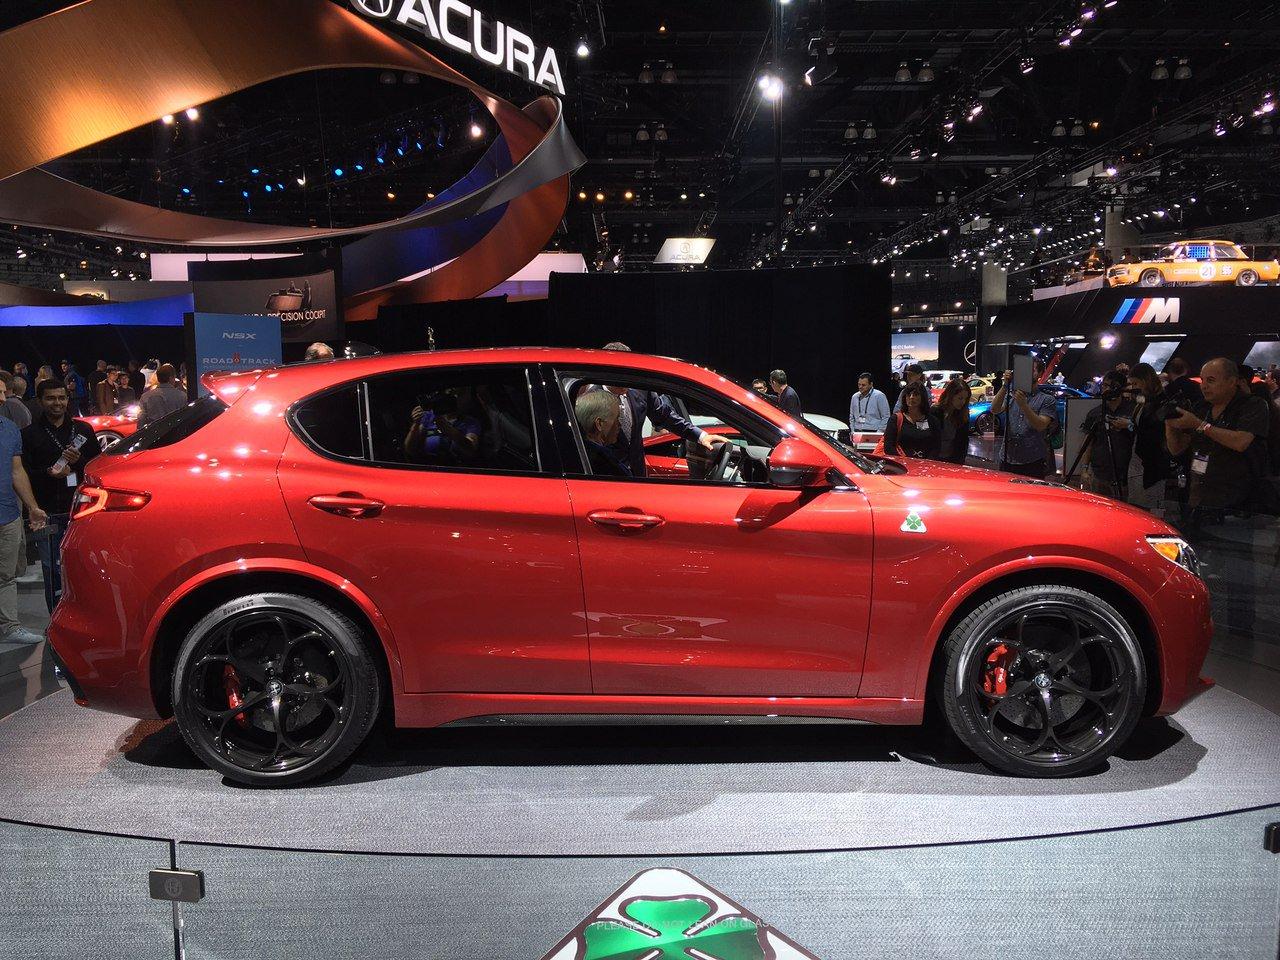 1479393145 omwnnzap7by - Alfa Romeo представила в Лос-Анджелесе кроссовер Stelvio QV